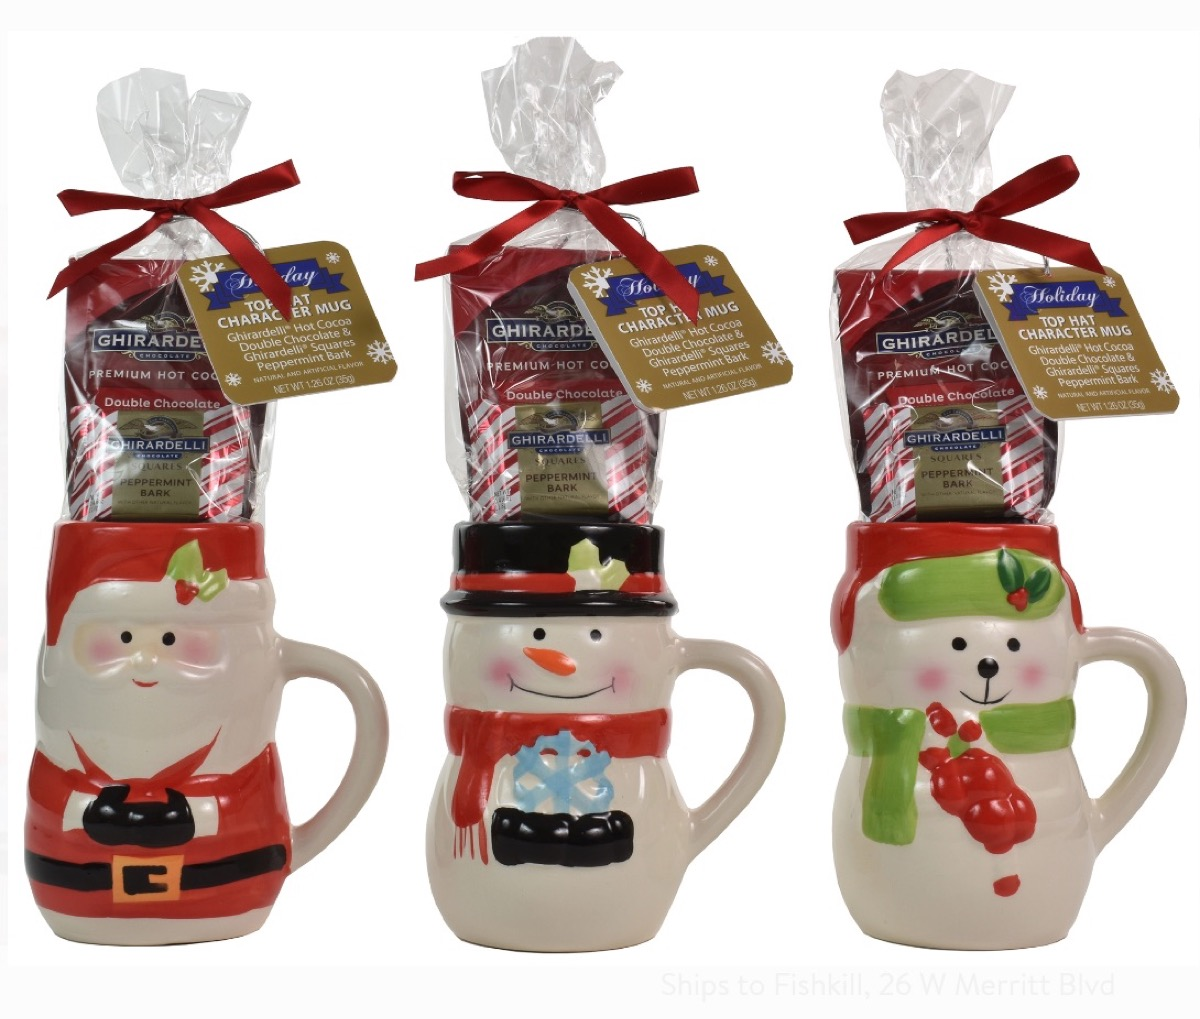 three ceramic holiday mugs with ghirardelli hot cocoa